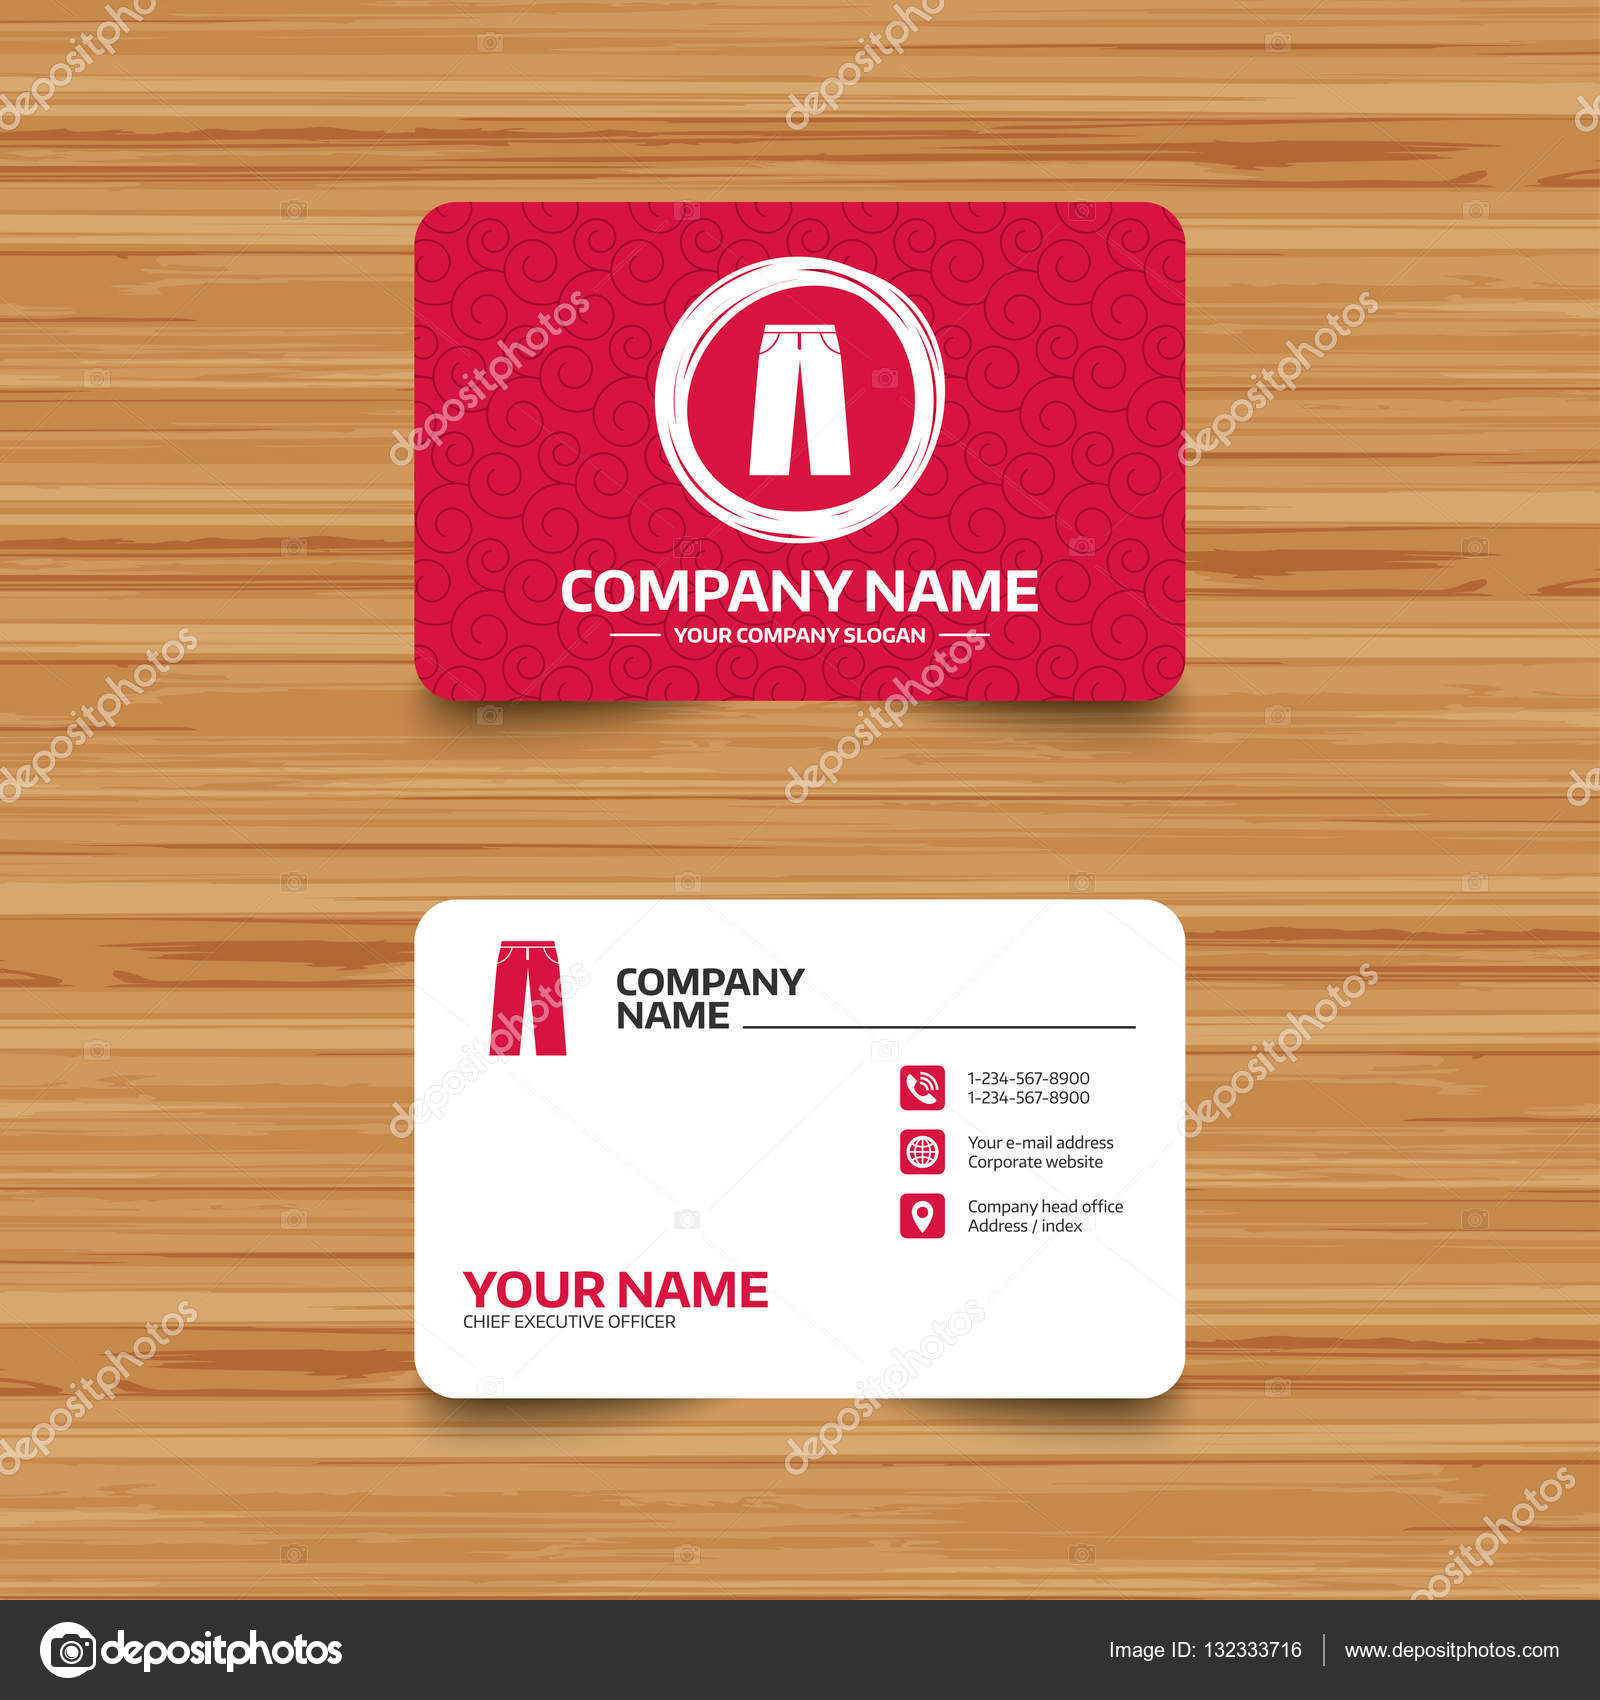 plantilla de tarjeta de visita — Vector de stock © Blankstock ...